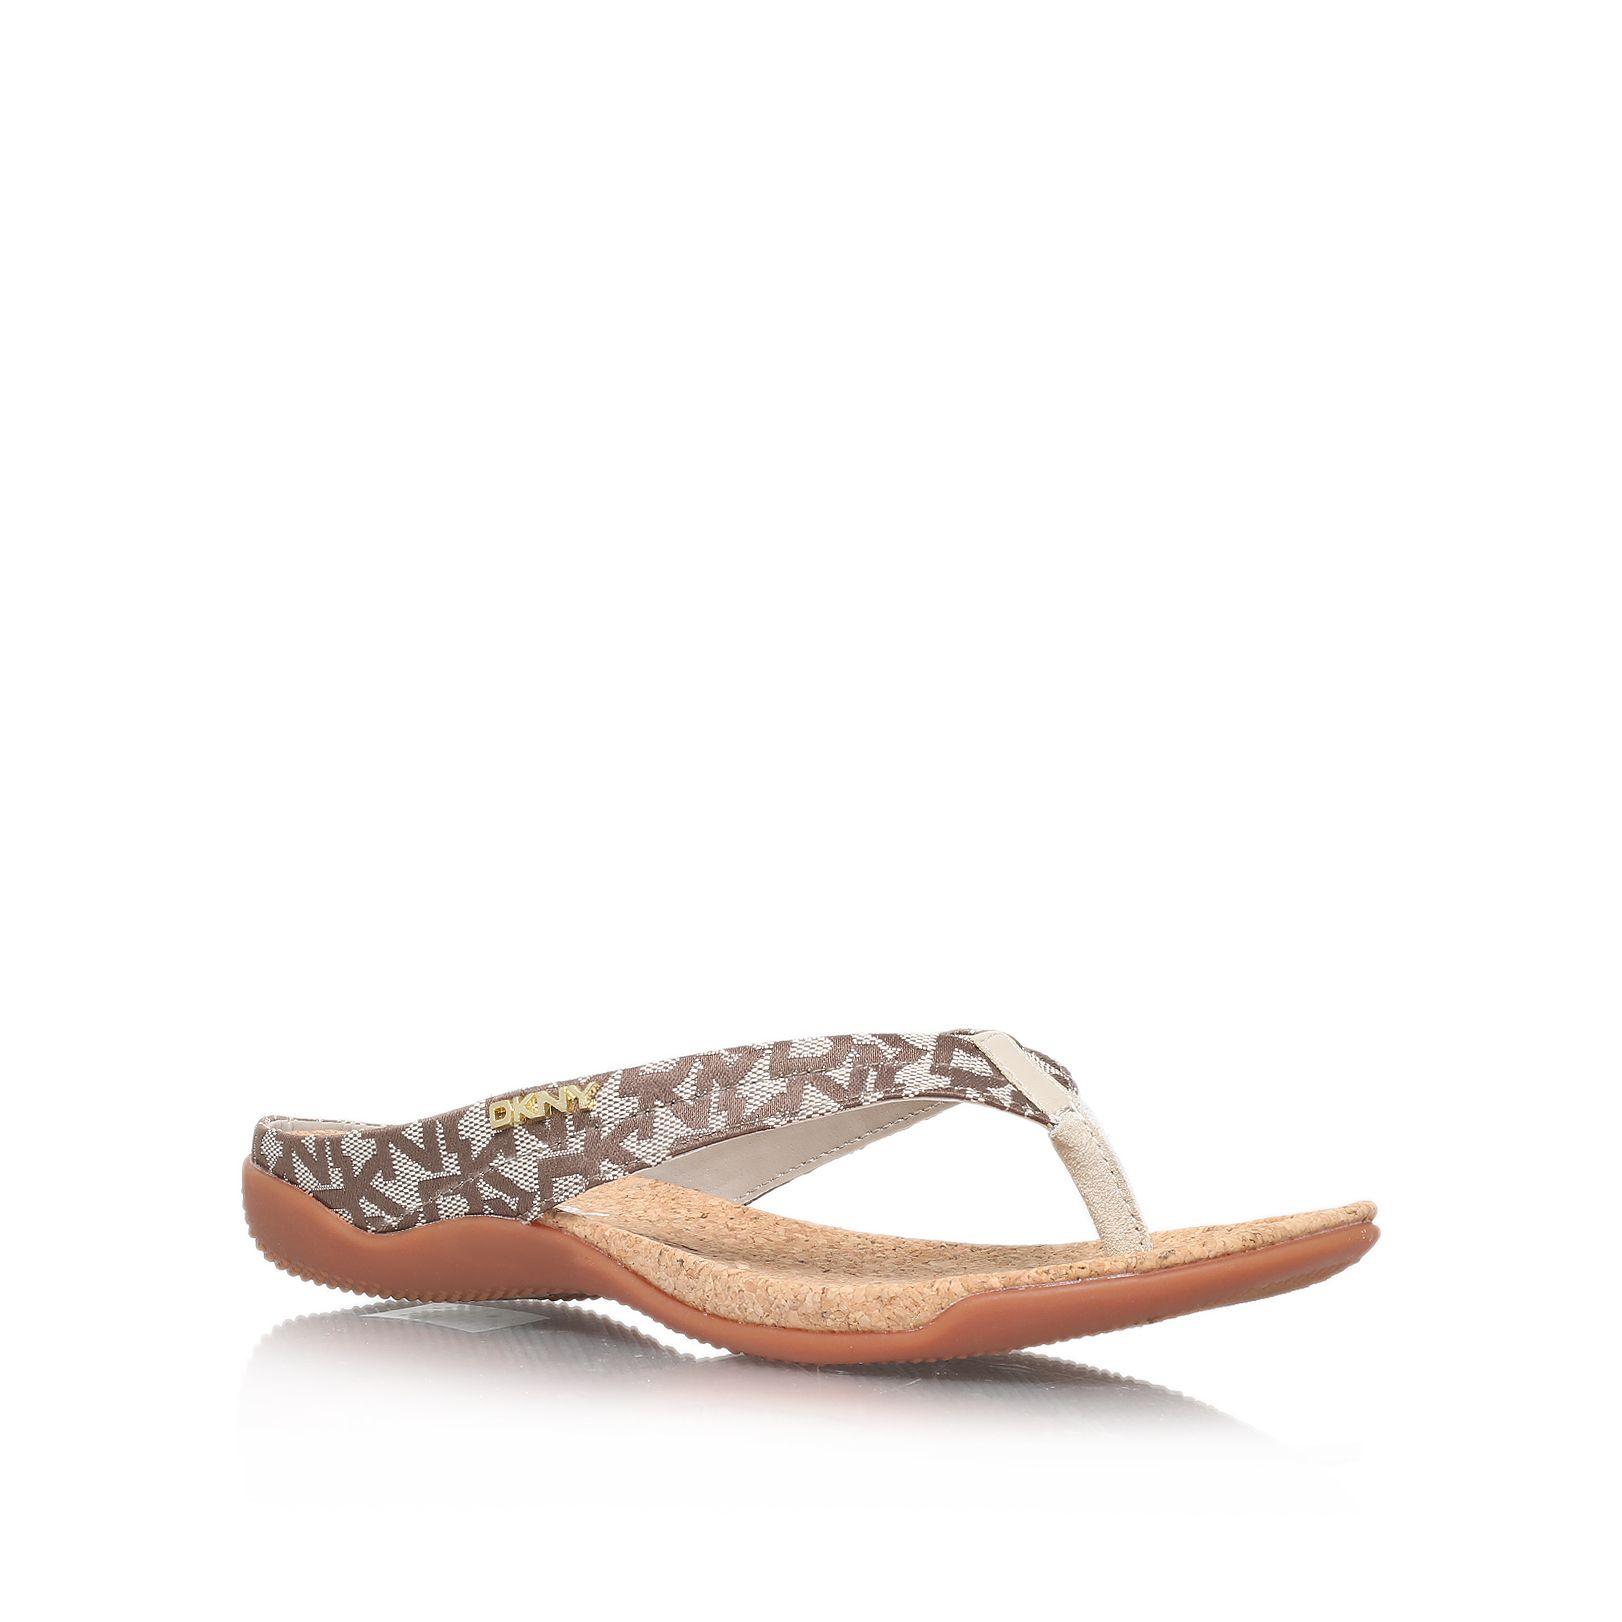 dkny sarasota thong sandal shoes in gray beige lyst